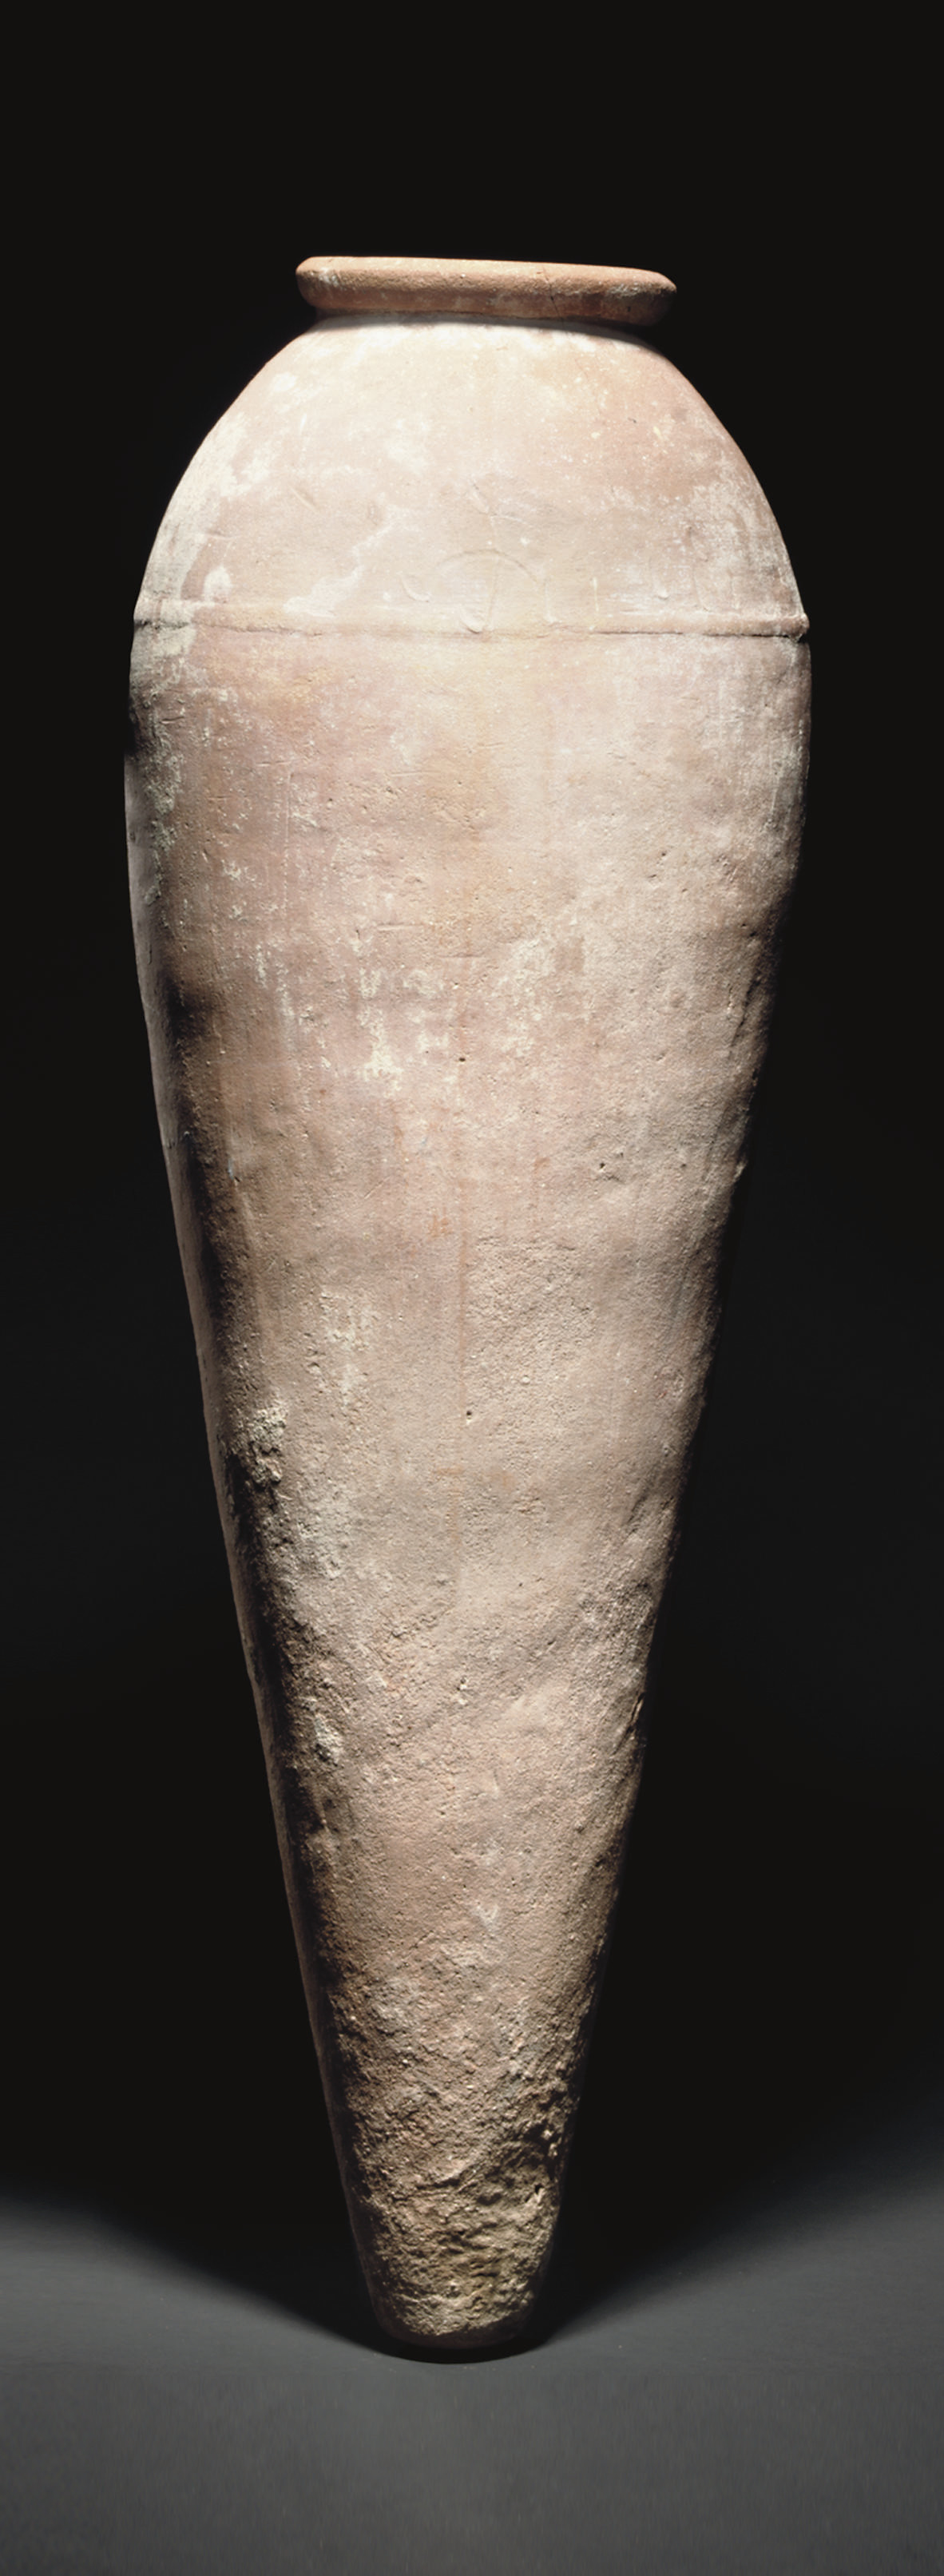 A LARGE EGYPTIAN POTTERY JAR